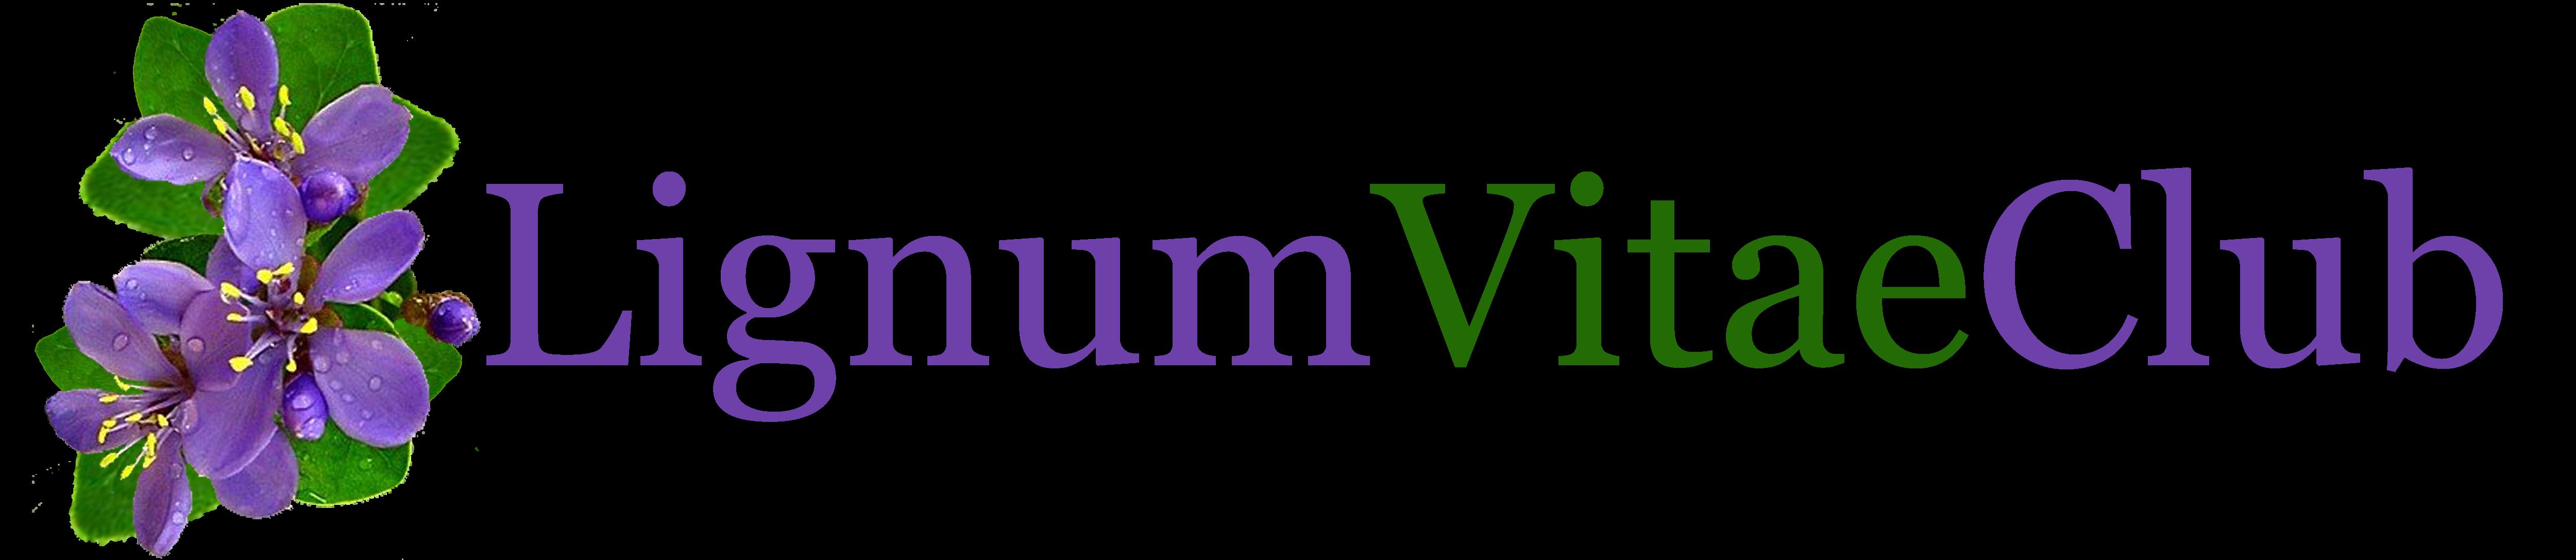 Lignum Vitae Club Logo